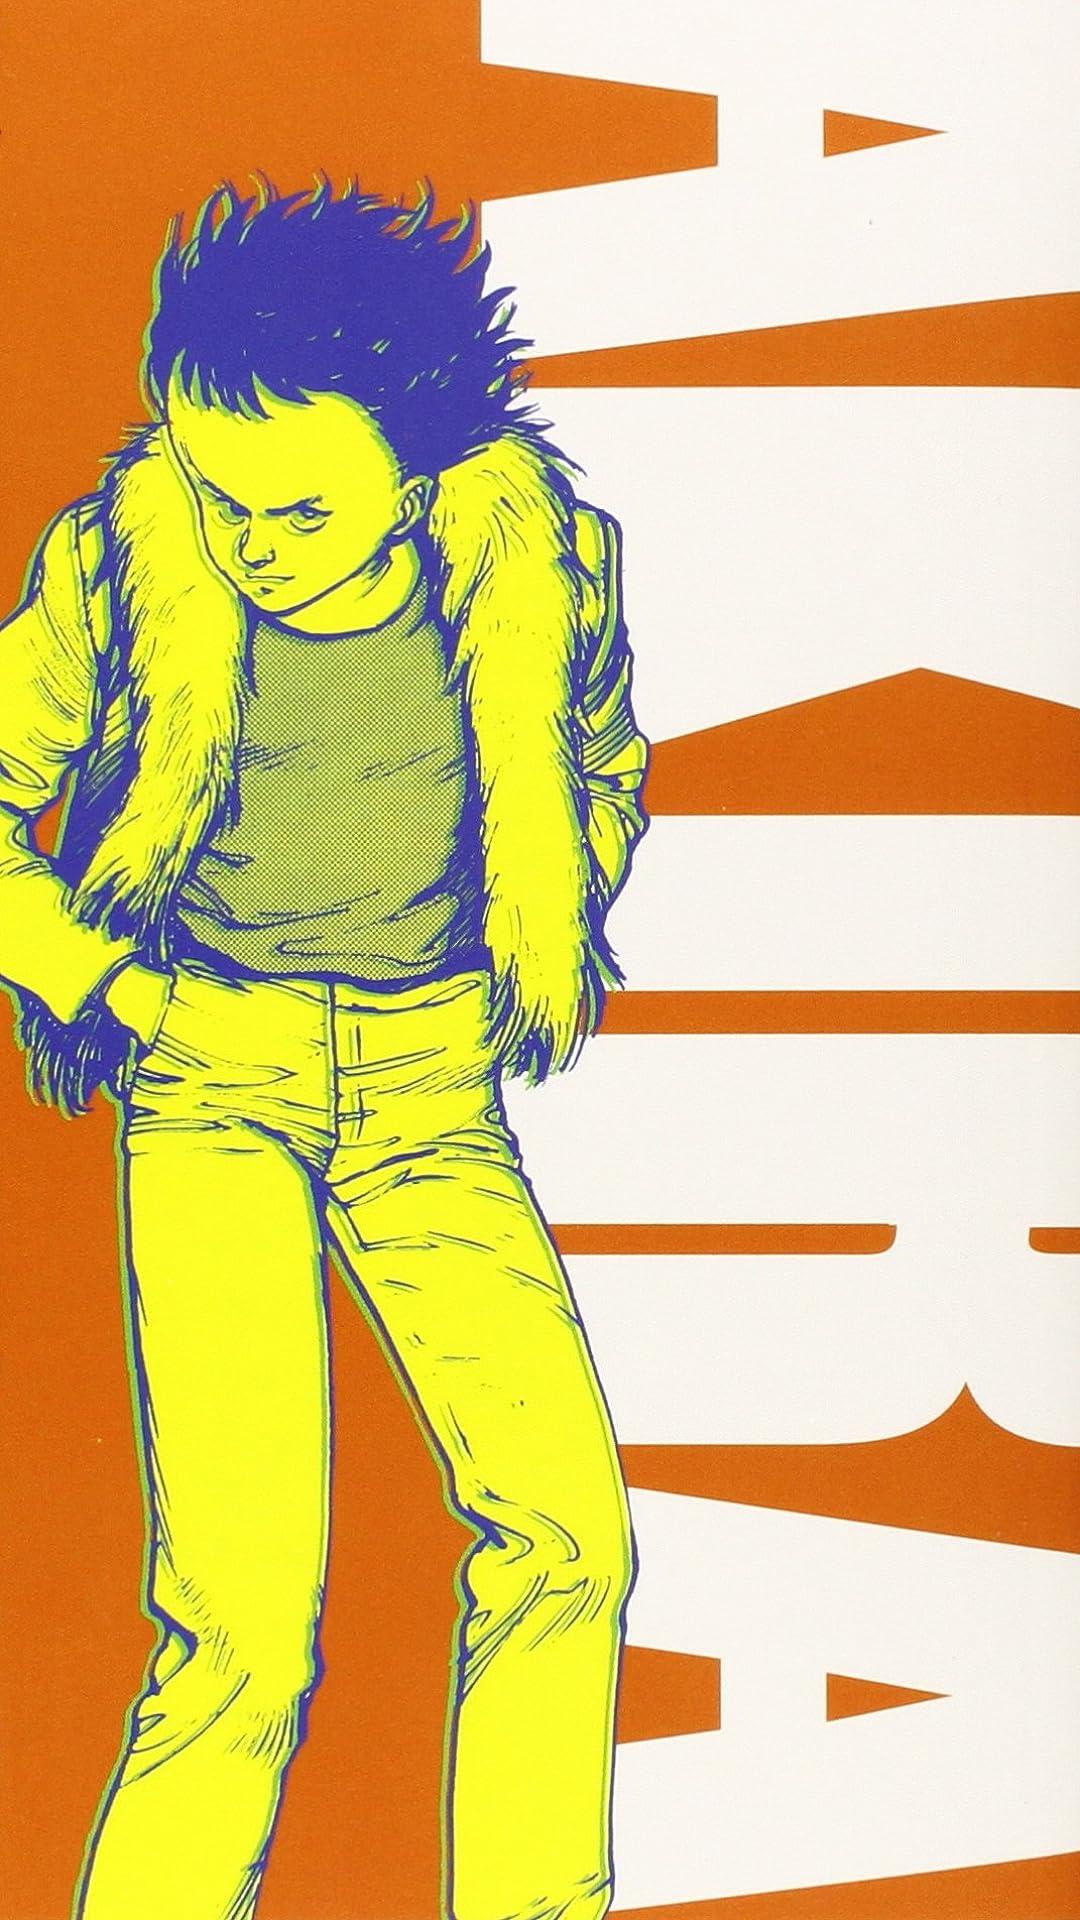 Akira フルhd 1080 19 スマホ壁紙 待受 島 鉄雄 しま てつお アニメ スマホ用画像